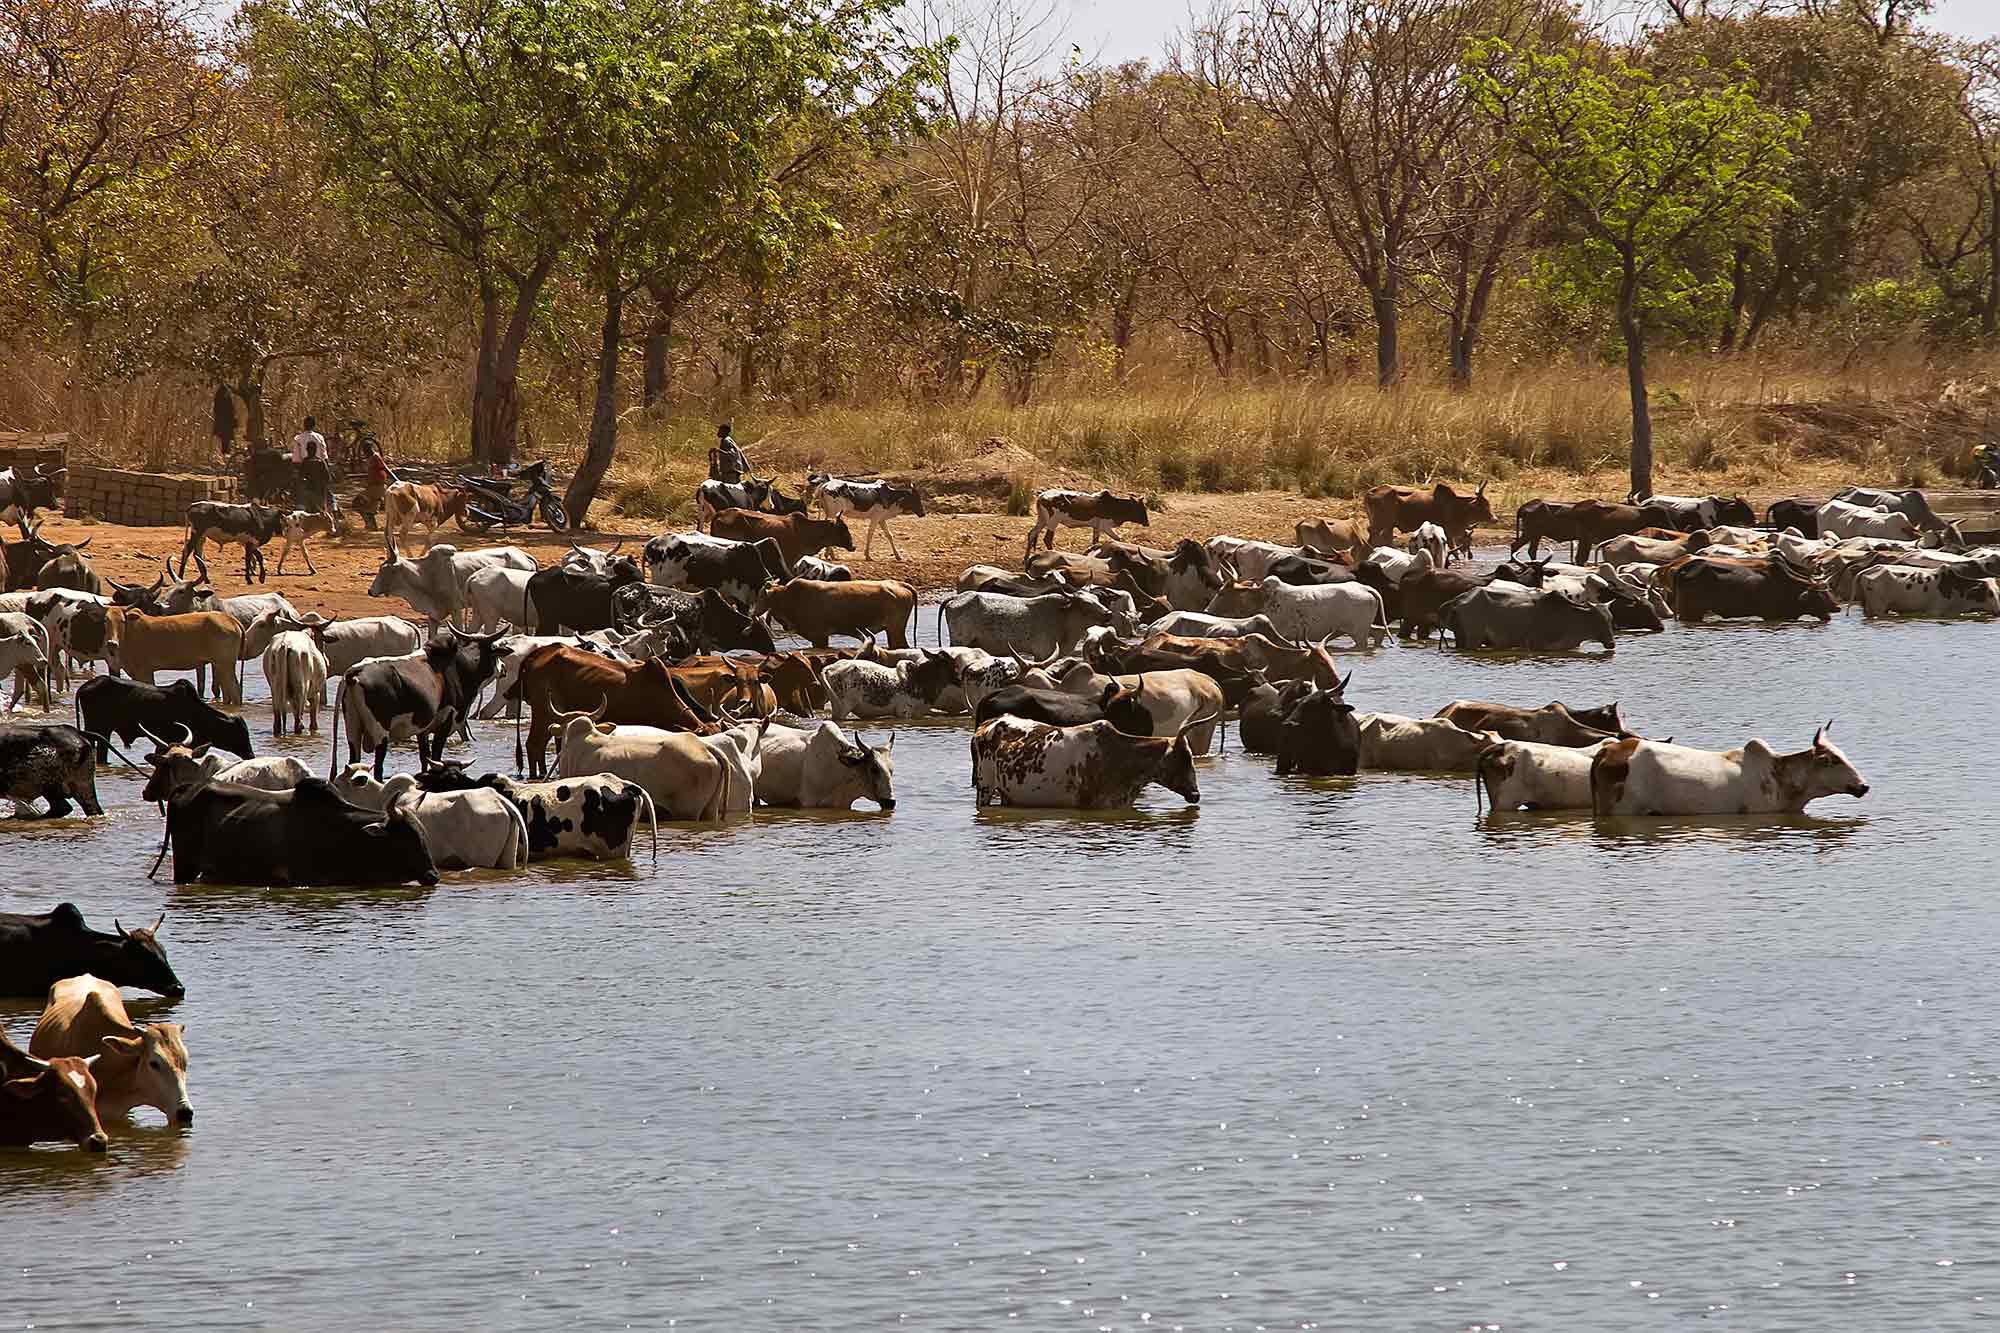 cattle-banfora-lake-burkina-faso-africa